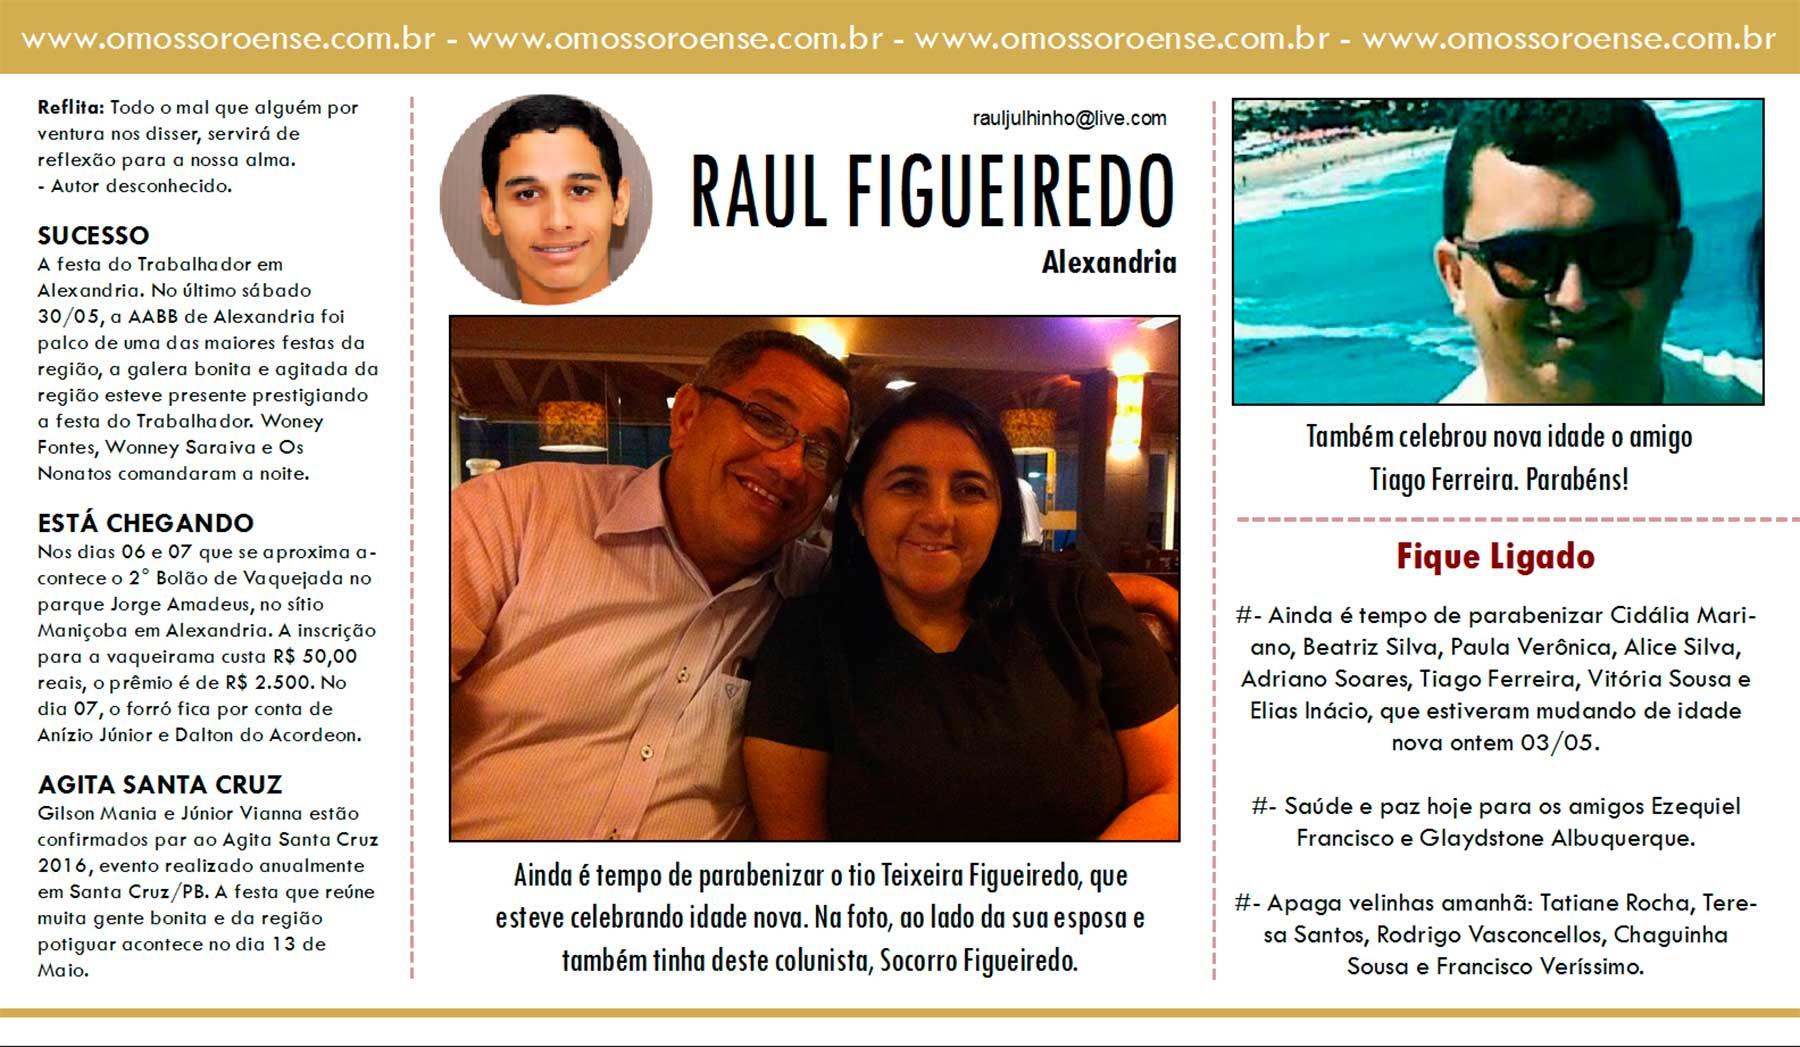 RAUL-FIGUEIREDO---04-05-2016